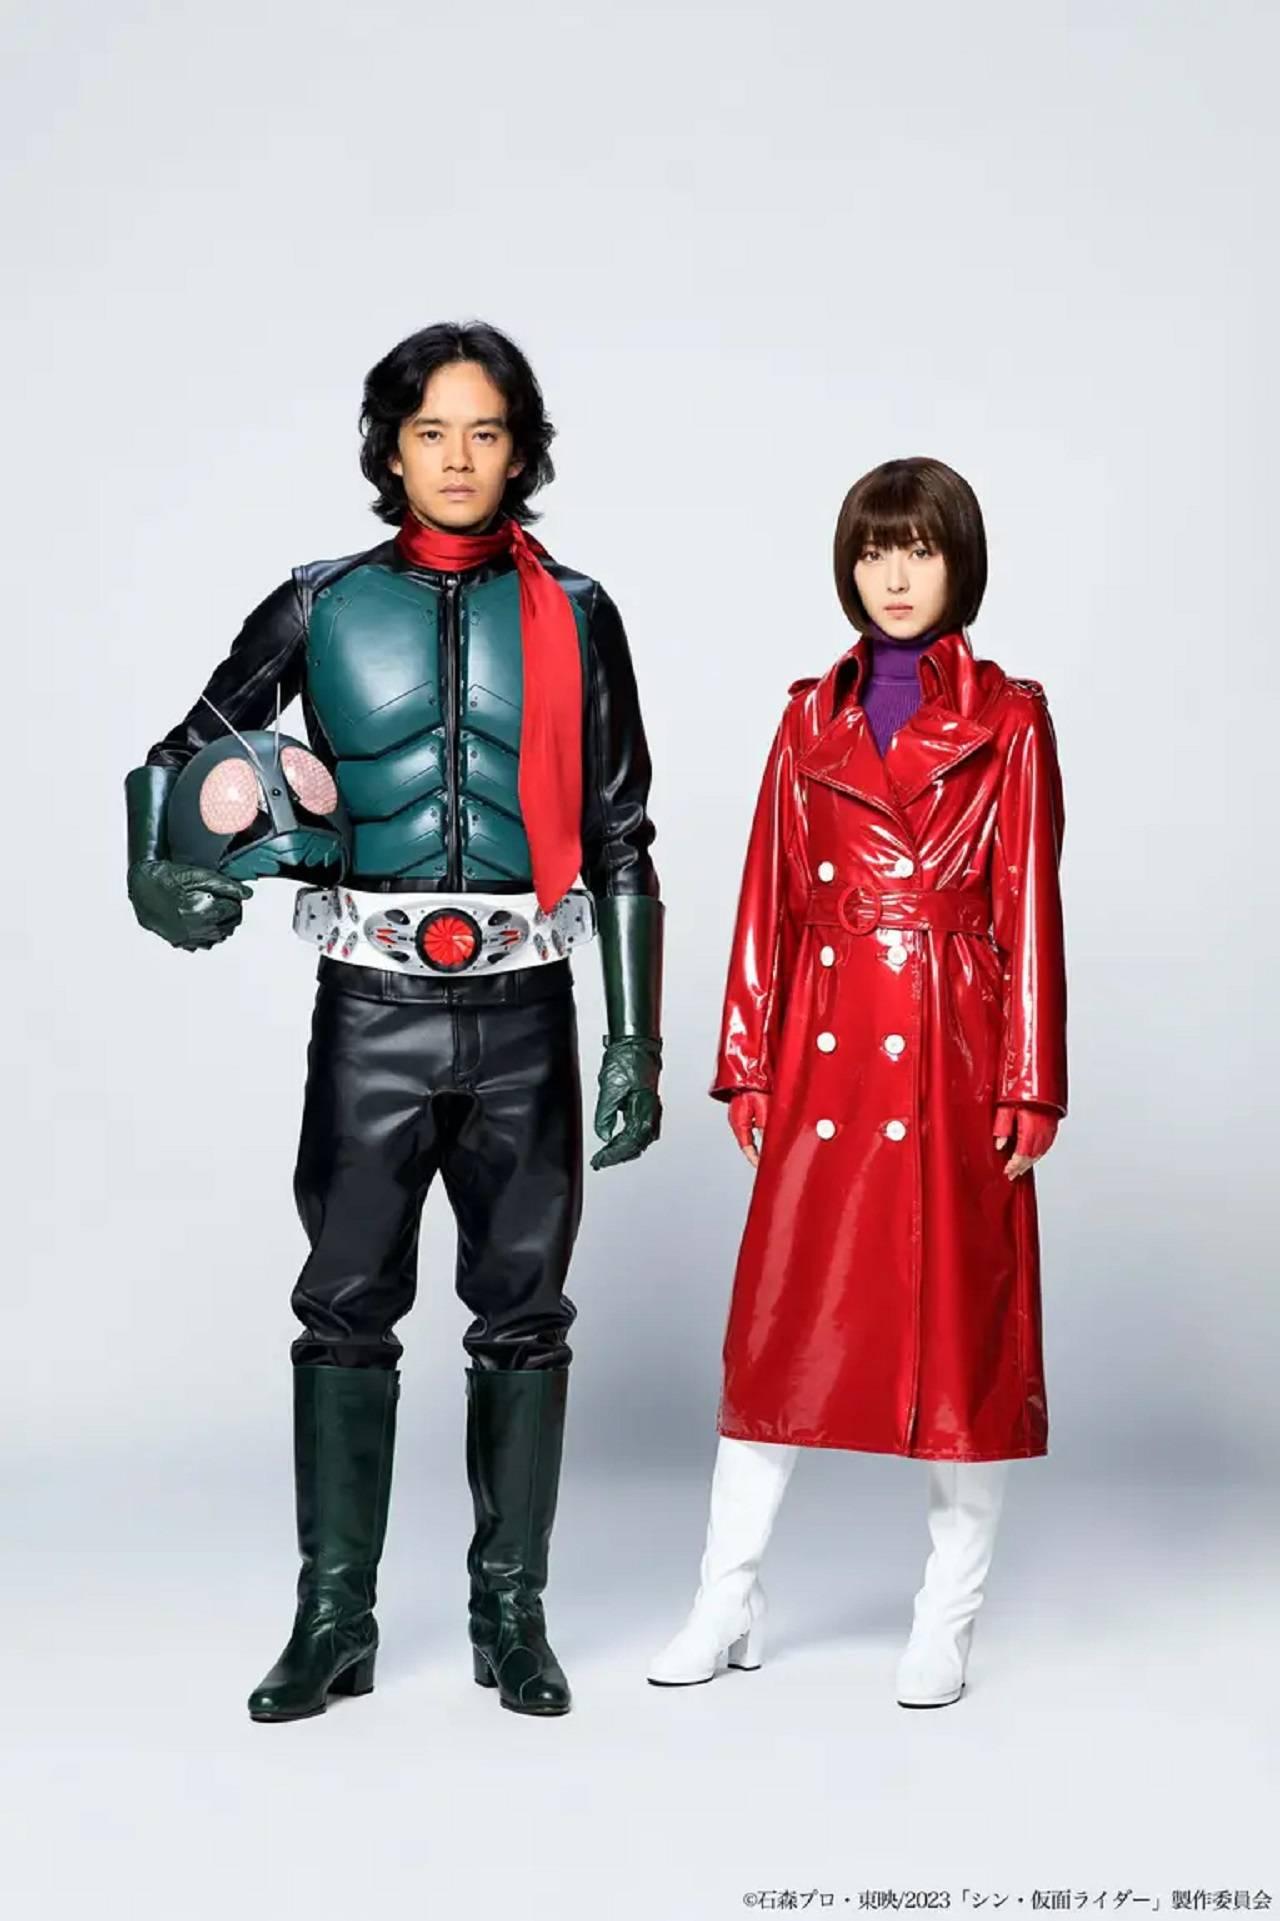 Shin Kamen Raider Película Hideaki Anno Toei Animation Sosuke Ikematsu Minami Hamabe